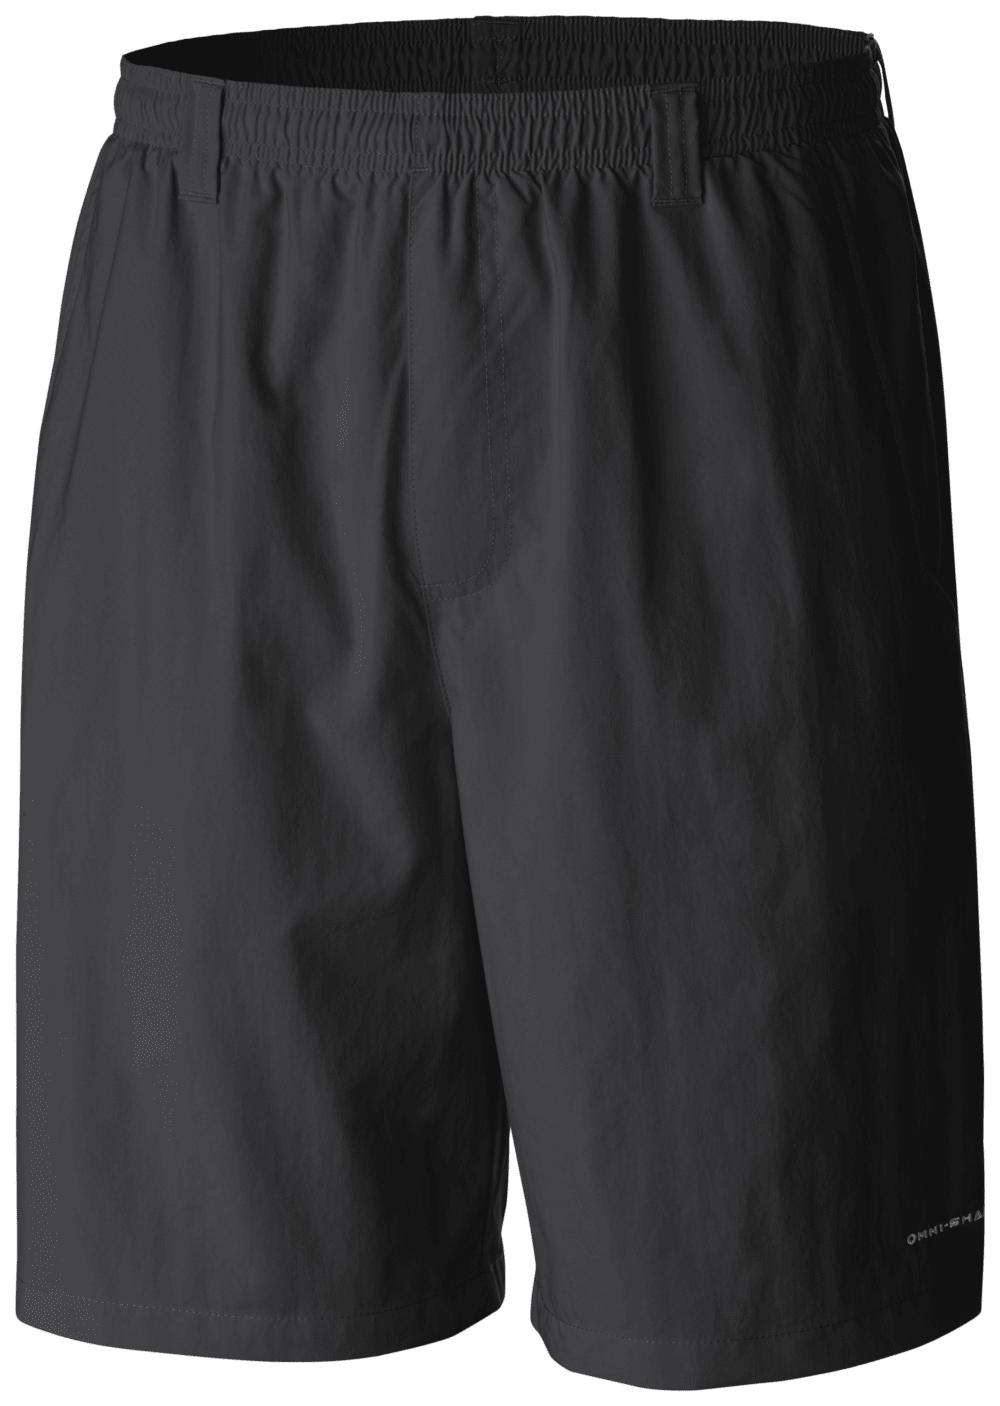 COLUMBIA Men's PFG Backcast III Water Shorts - BLACK-010